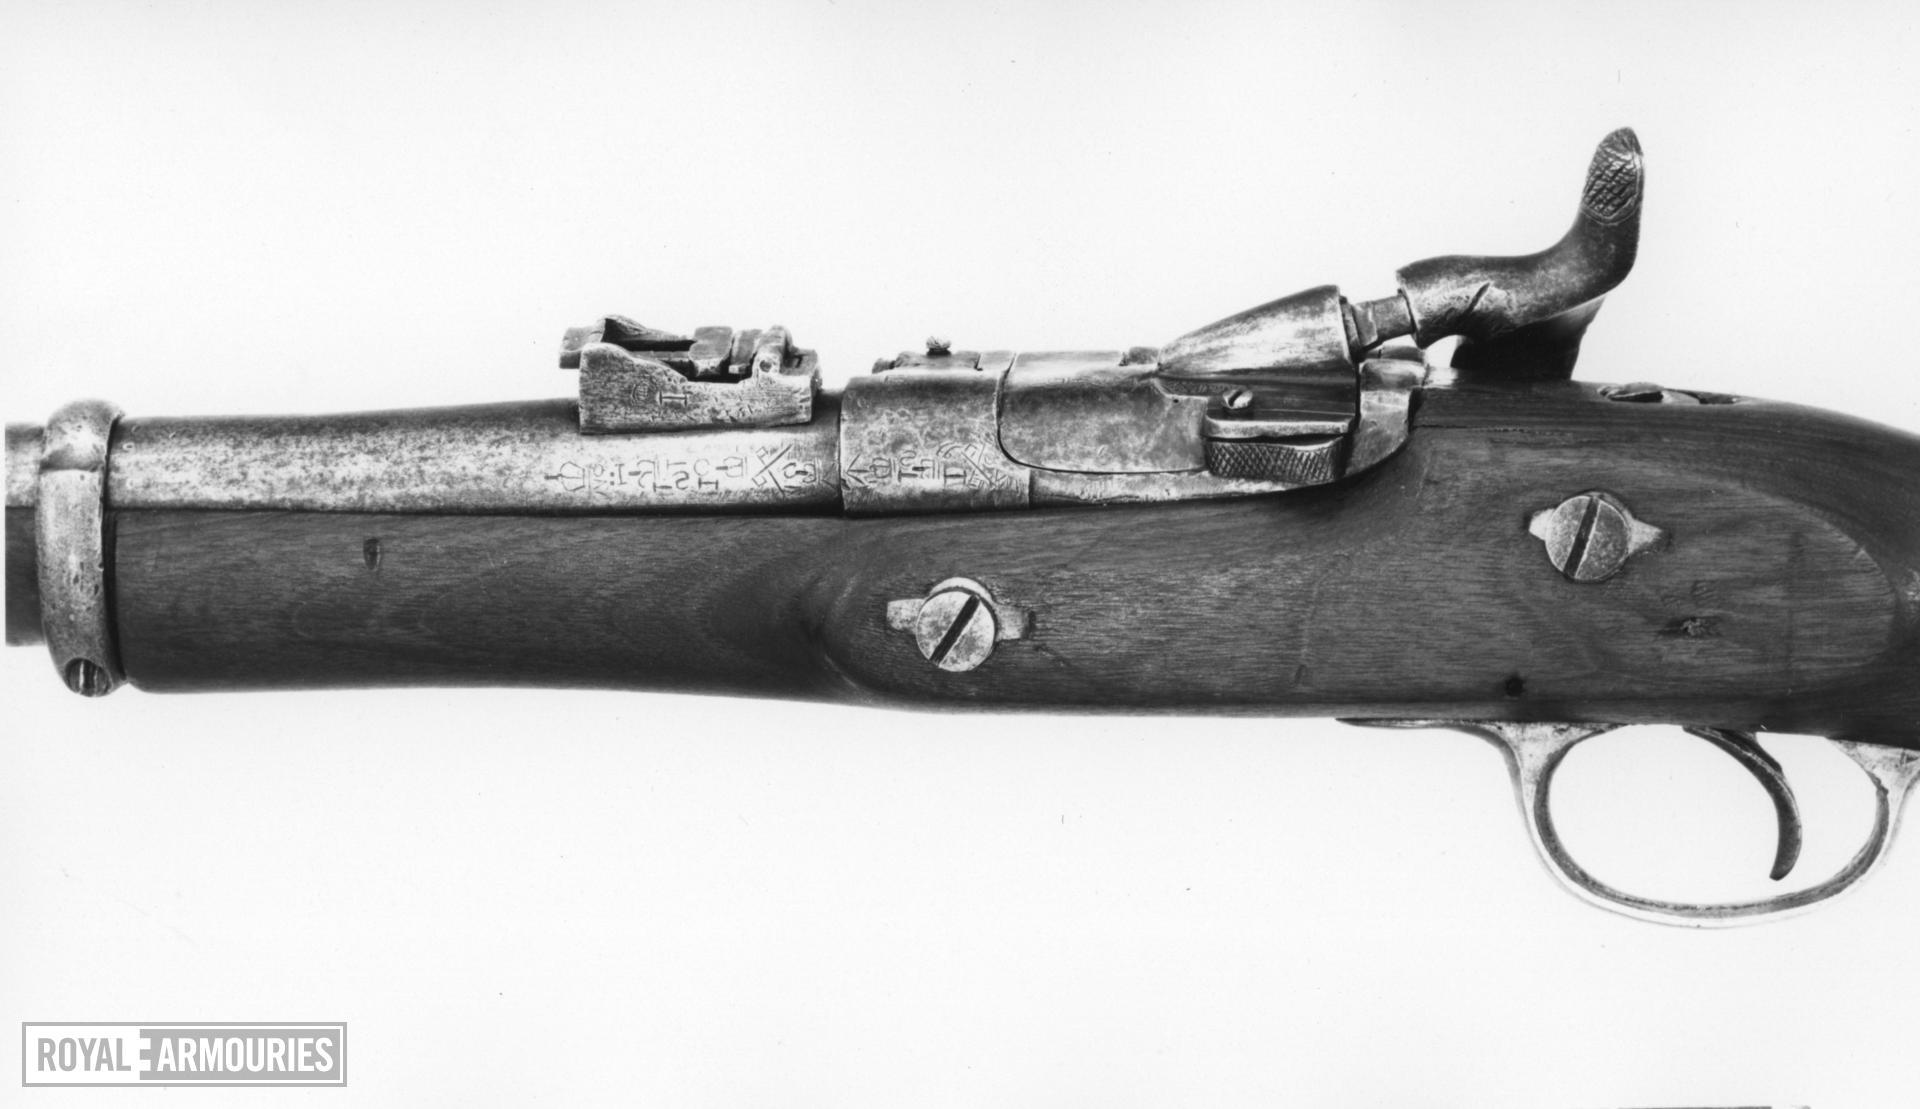 Centrefire carbine